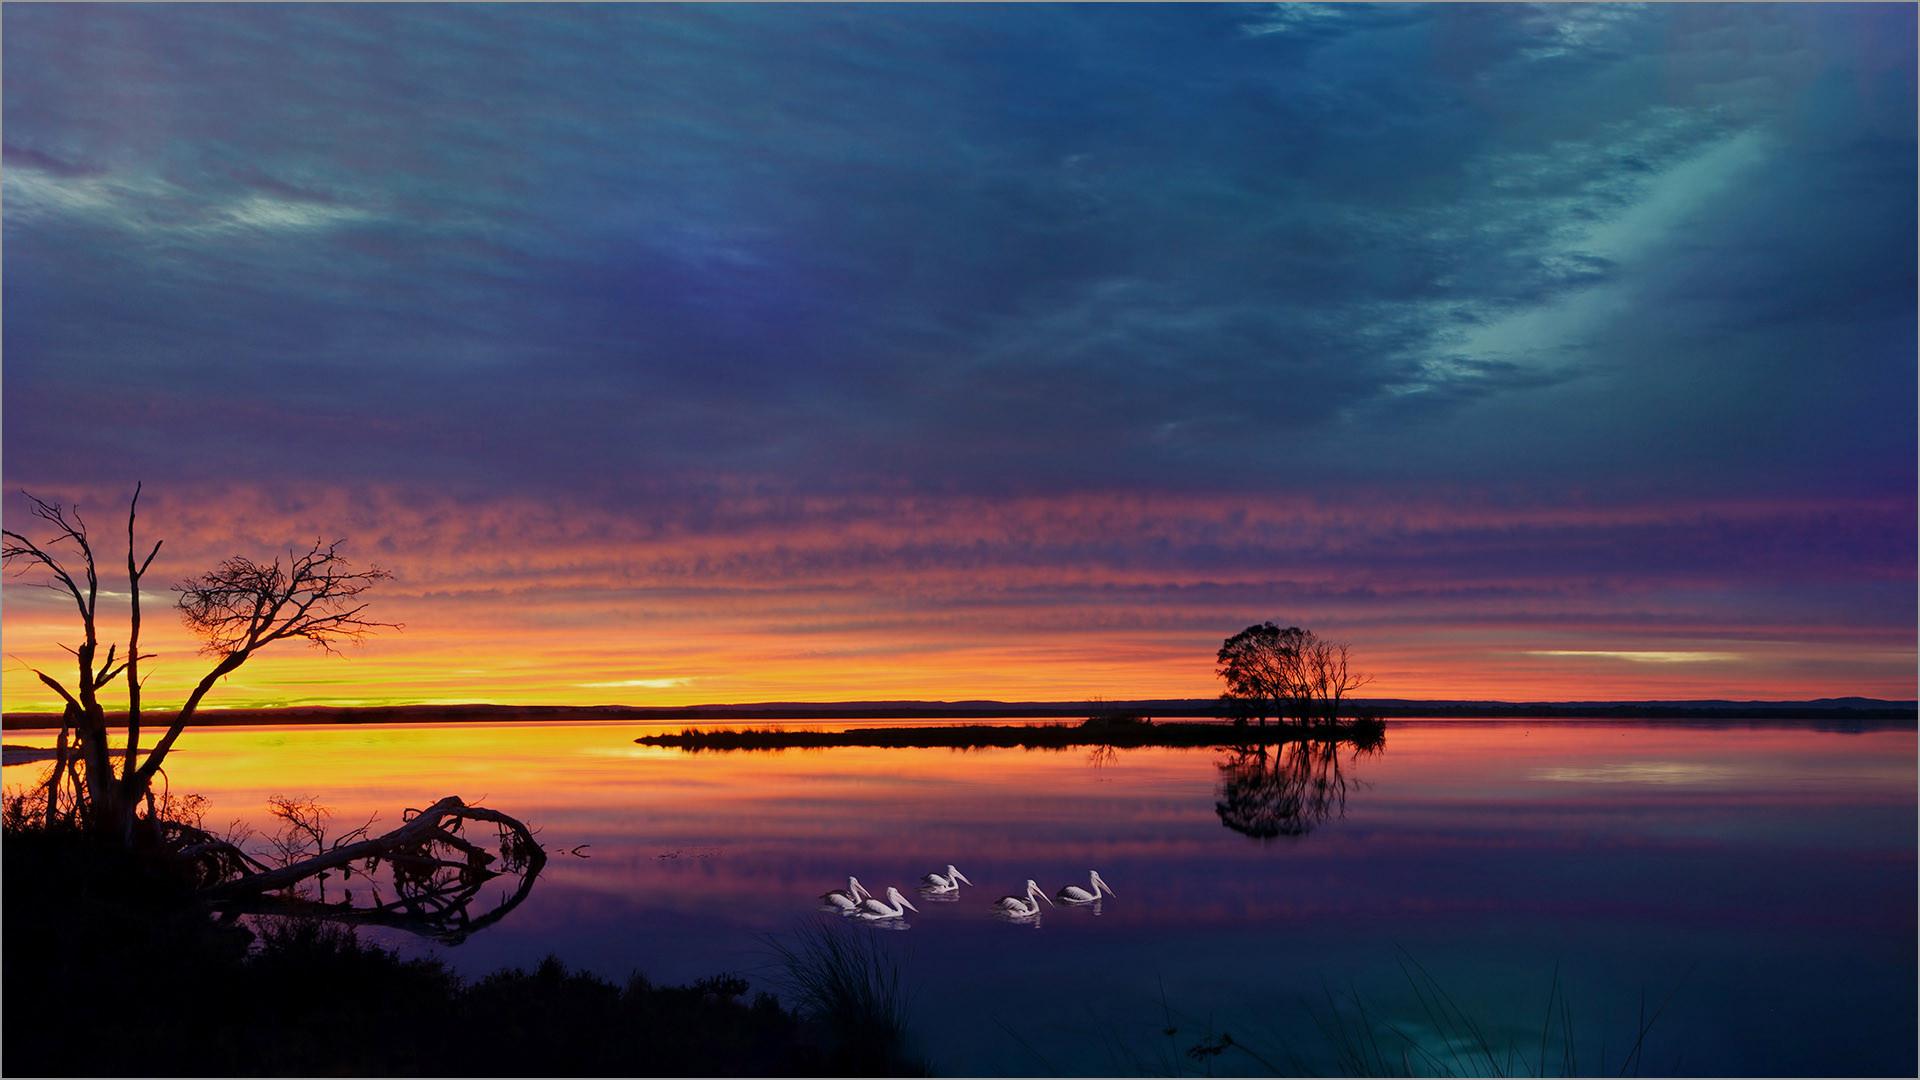 Sunrise at Island Pt.